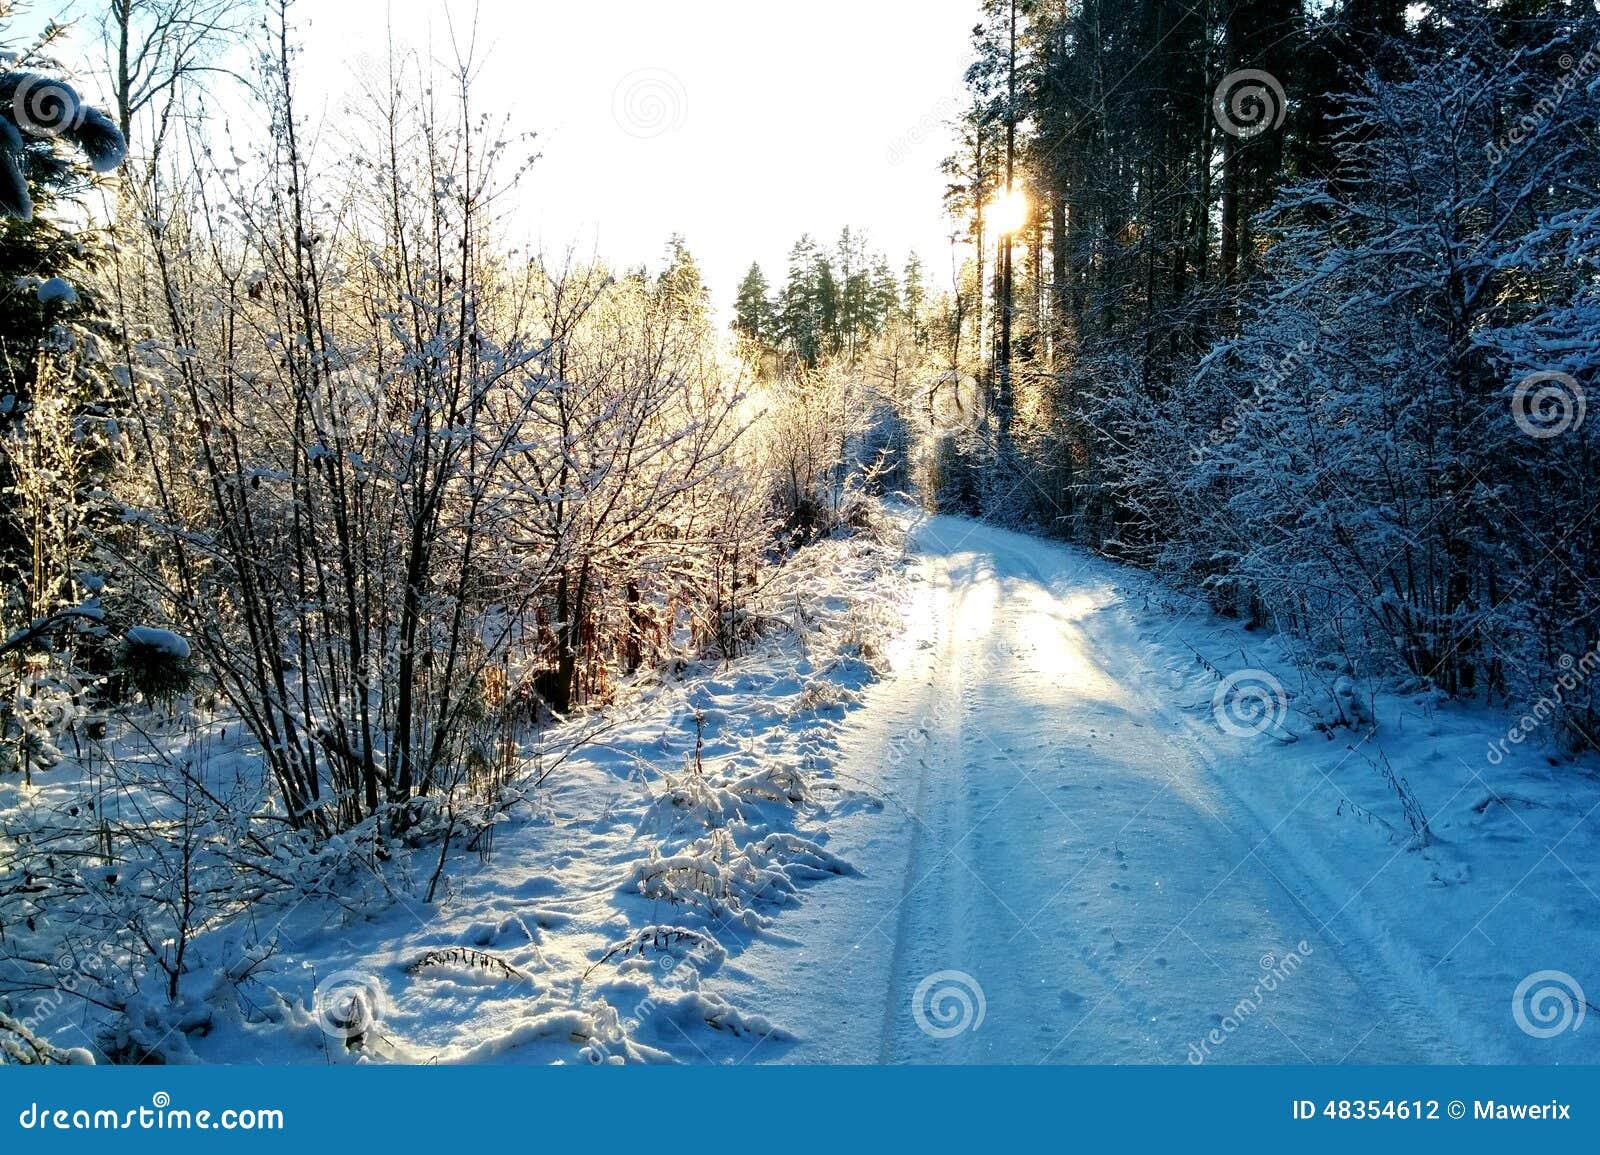 Winter road in sun